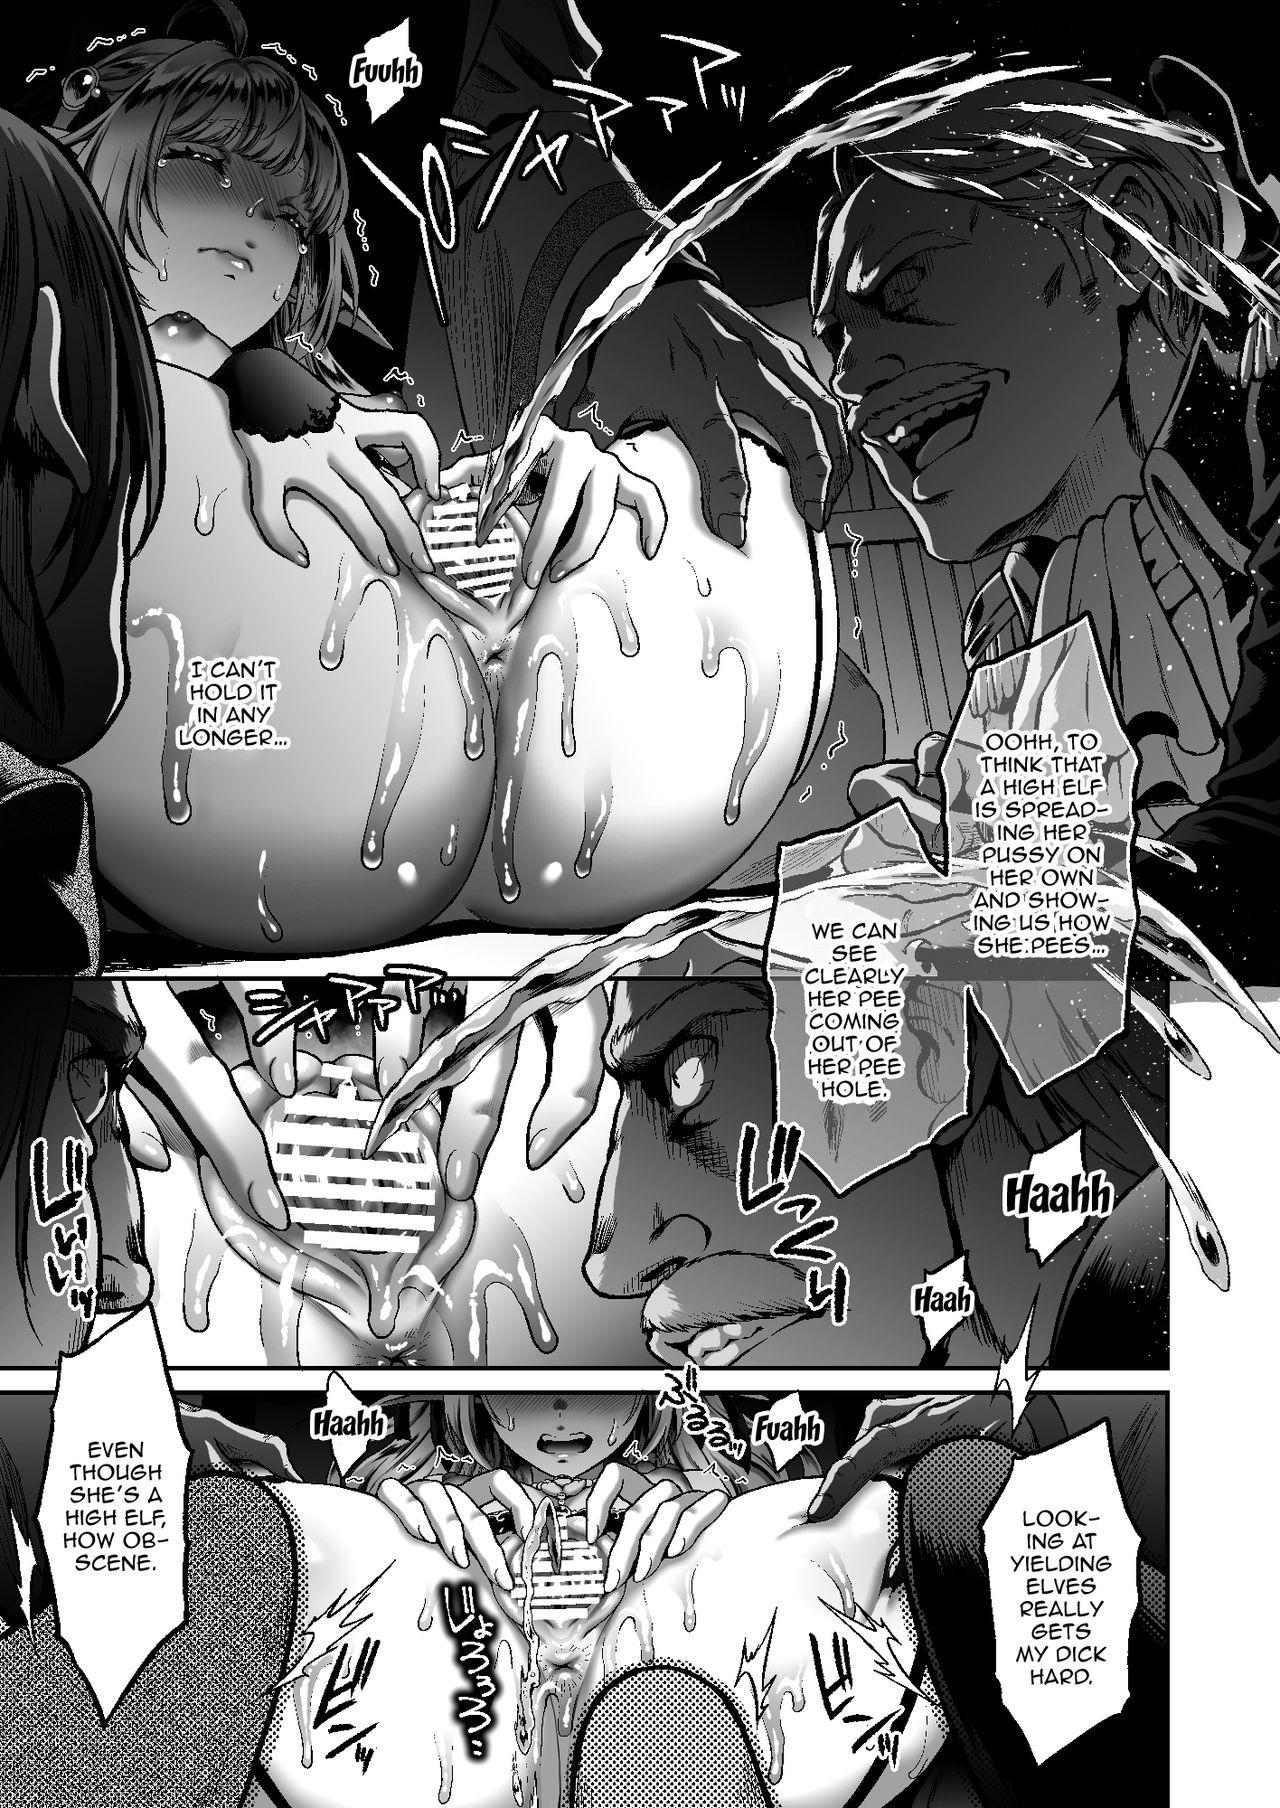 Tasogare no Shou Elf 6 - The story of Emma's side   Twilight Elf Prostitute 6 10